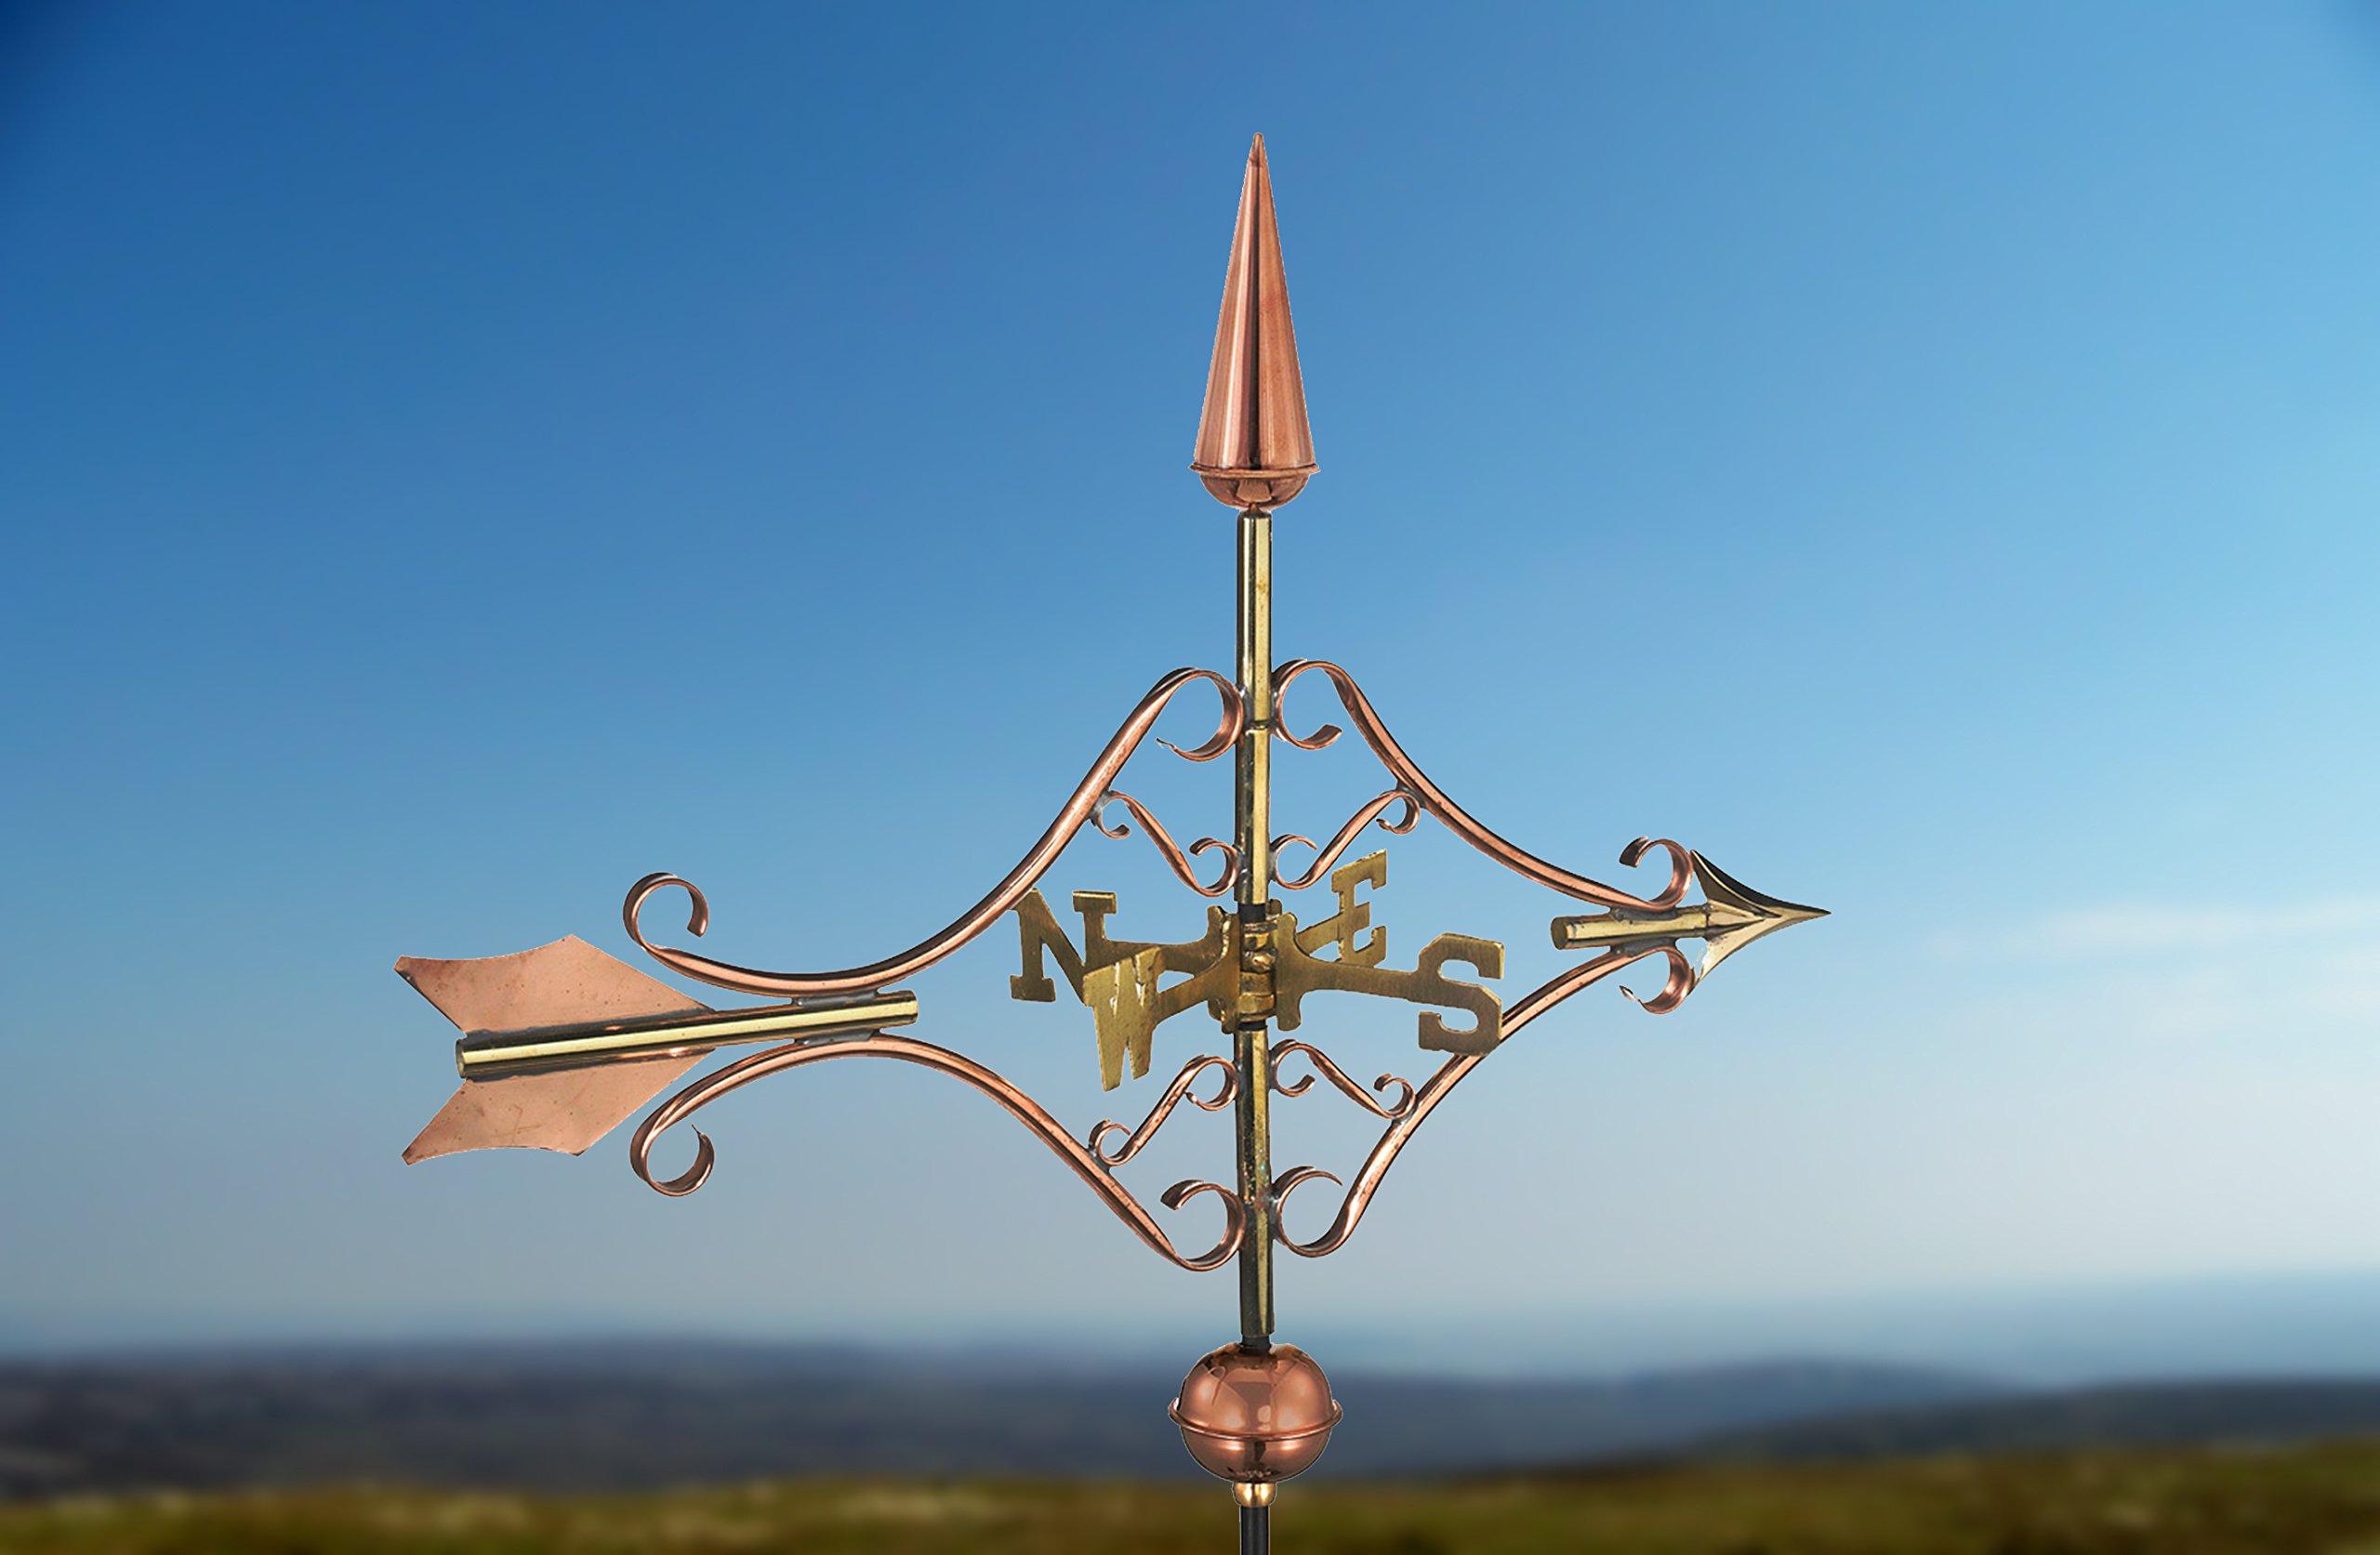 Good Directions Victorian Arrow Garden Weathervane with Garden Pole, Pure Copper